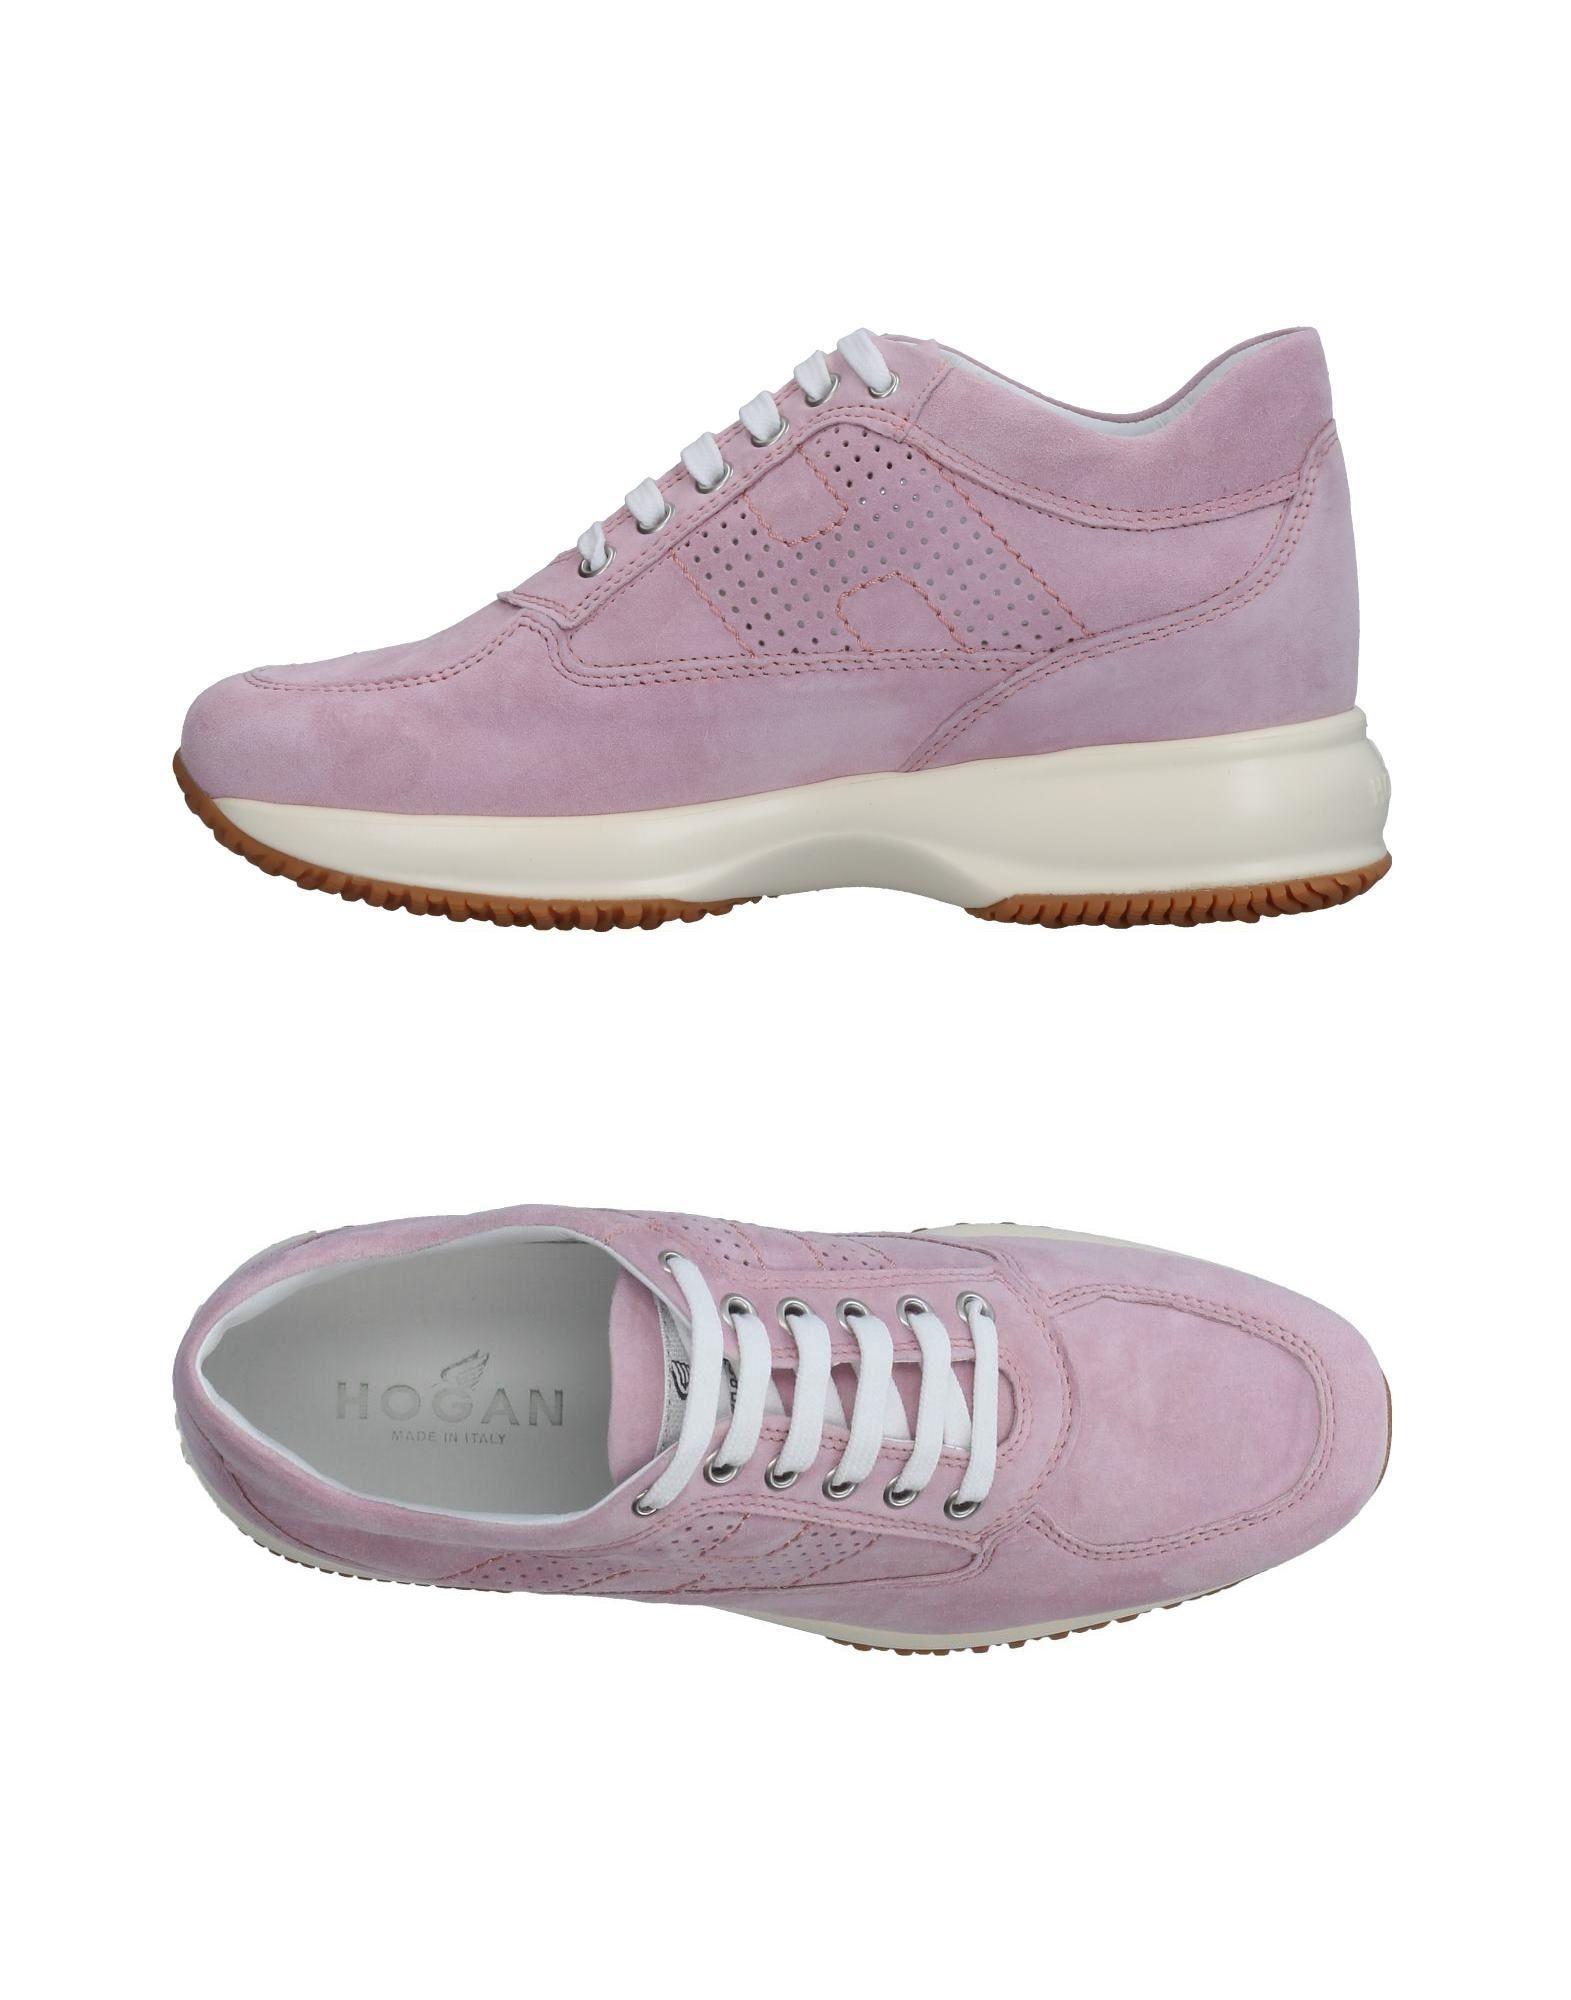 Moda Sneakers Hogan Donna - 11336799PJ